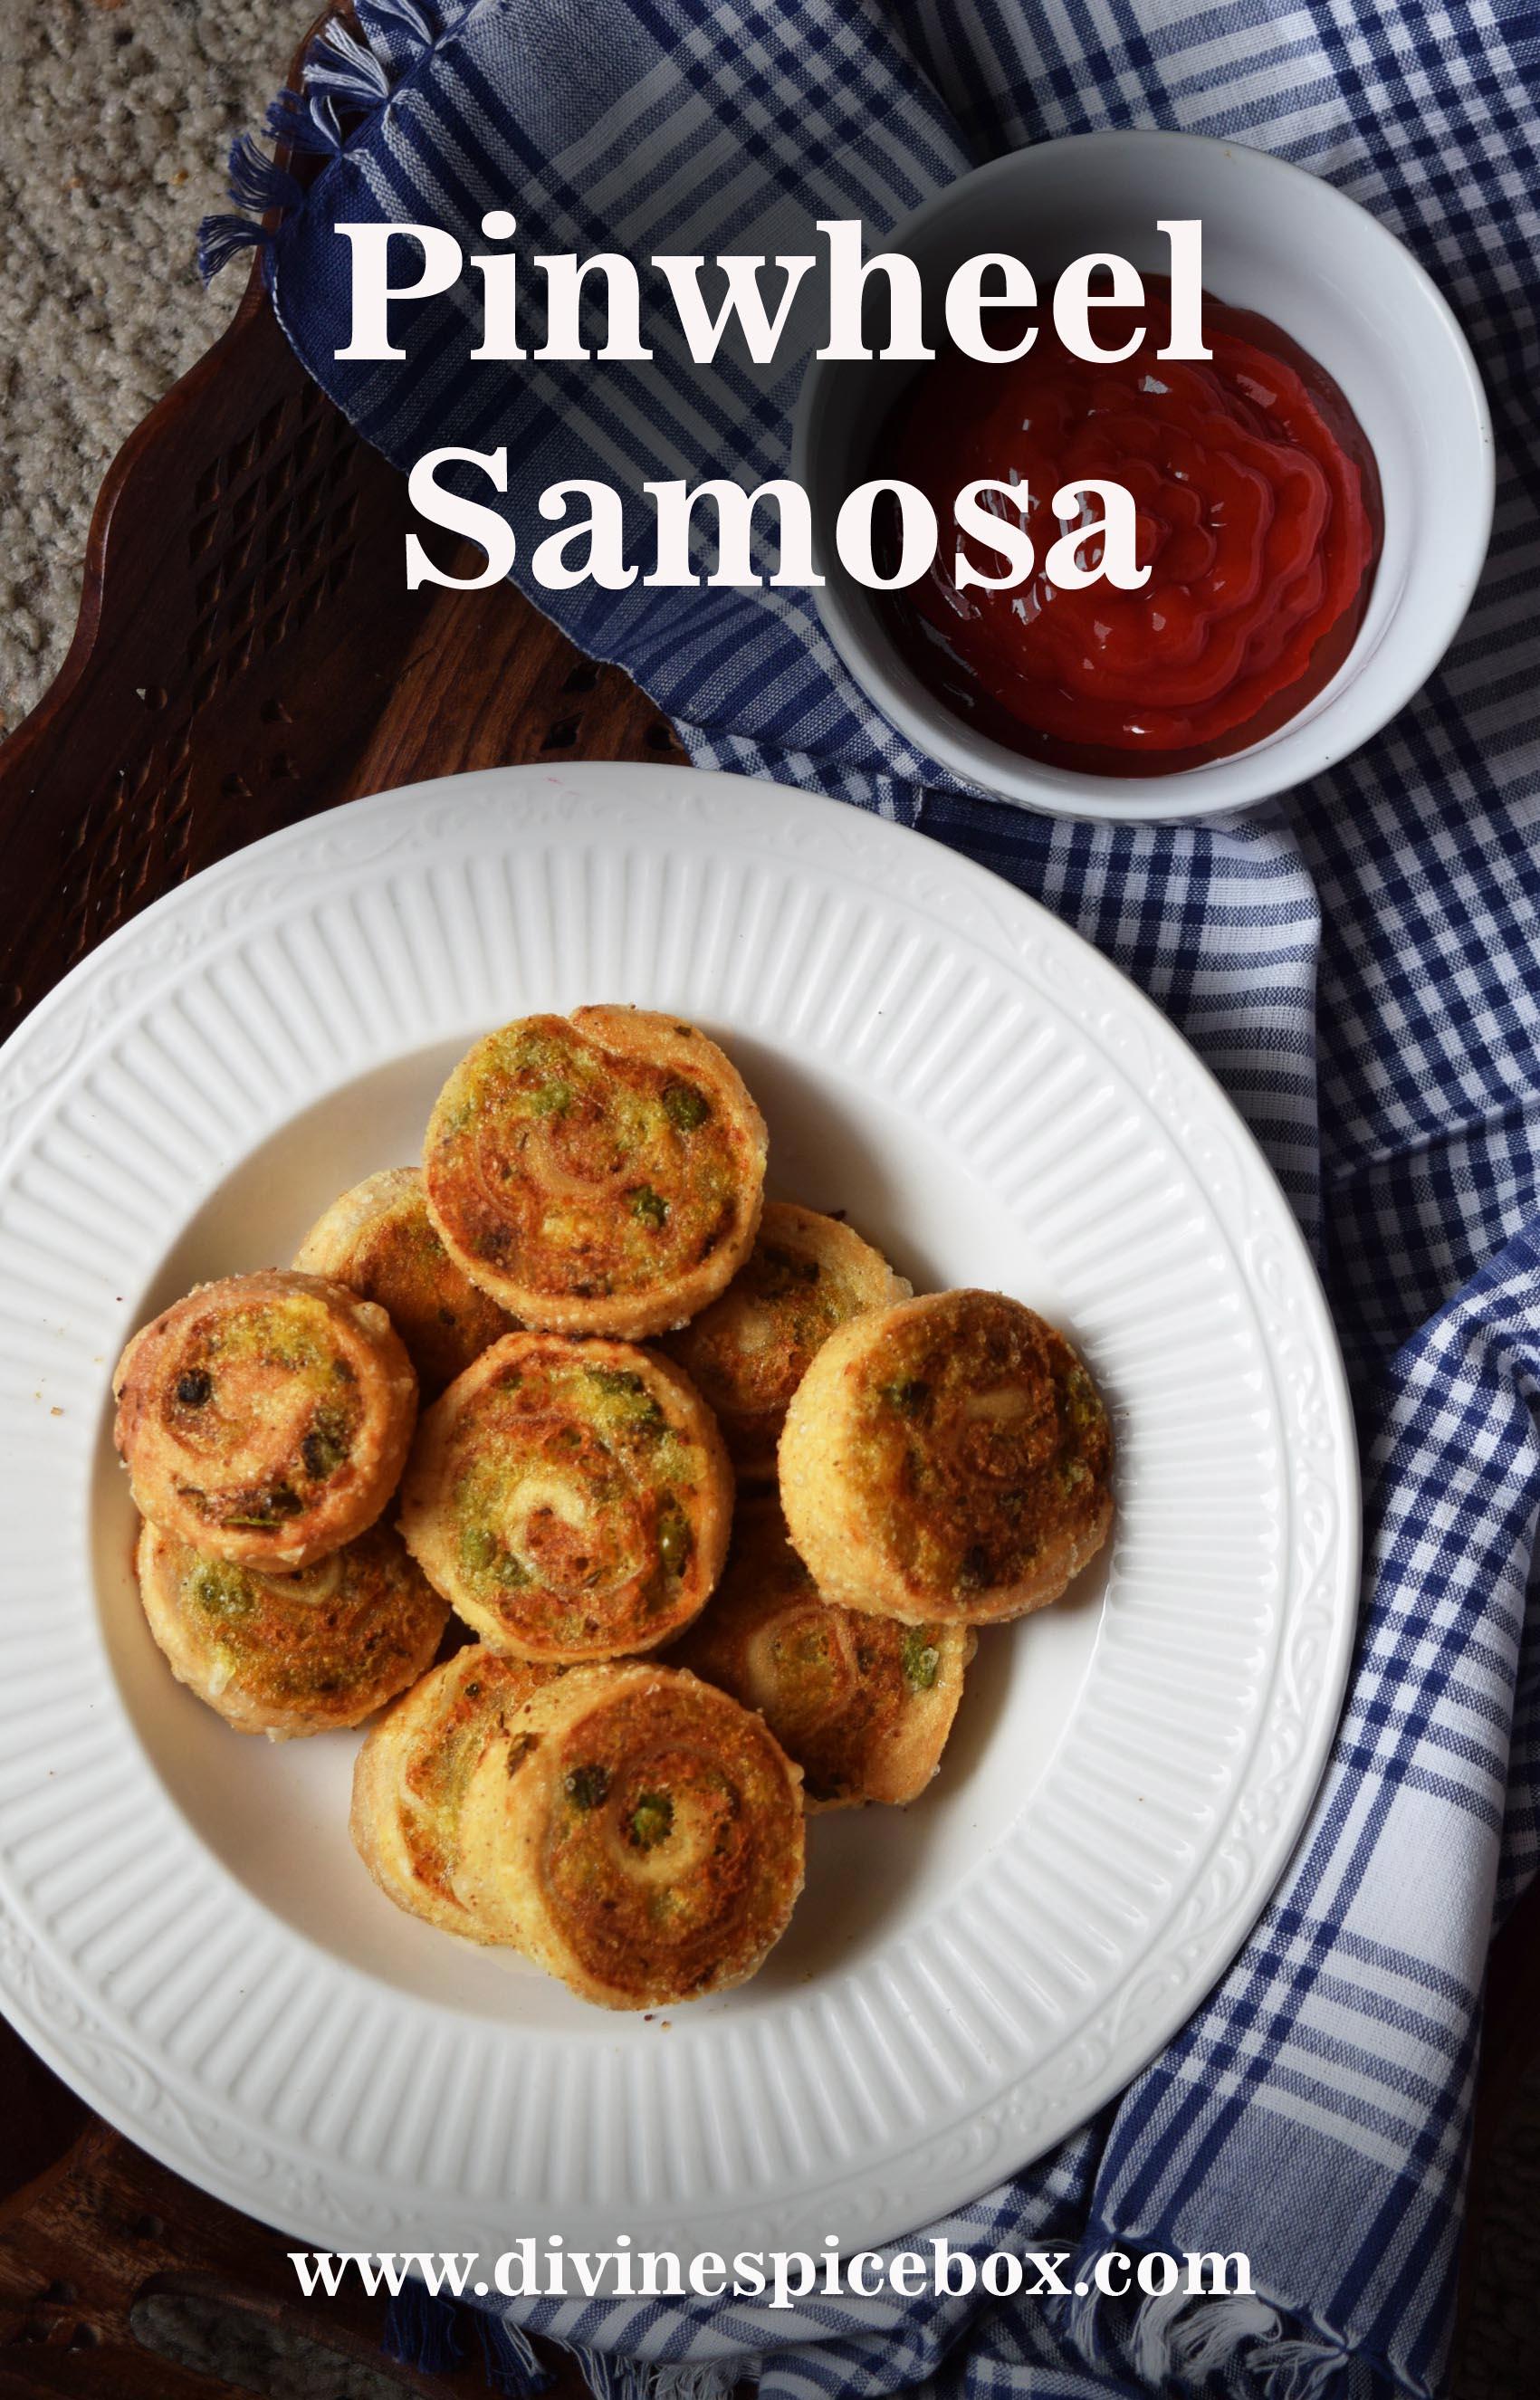 Piinwheel Samosa close up